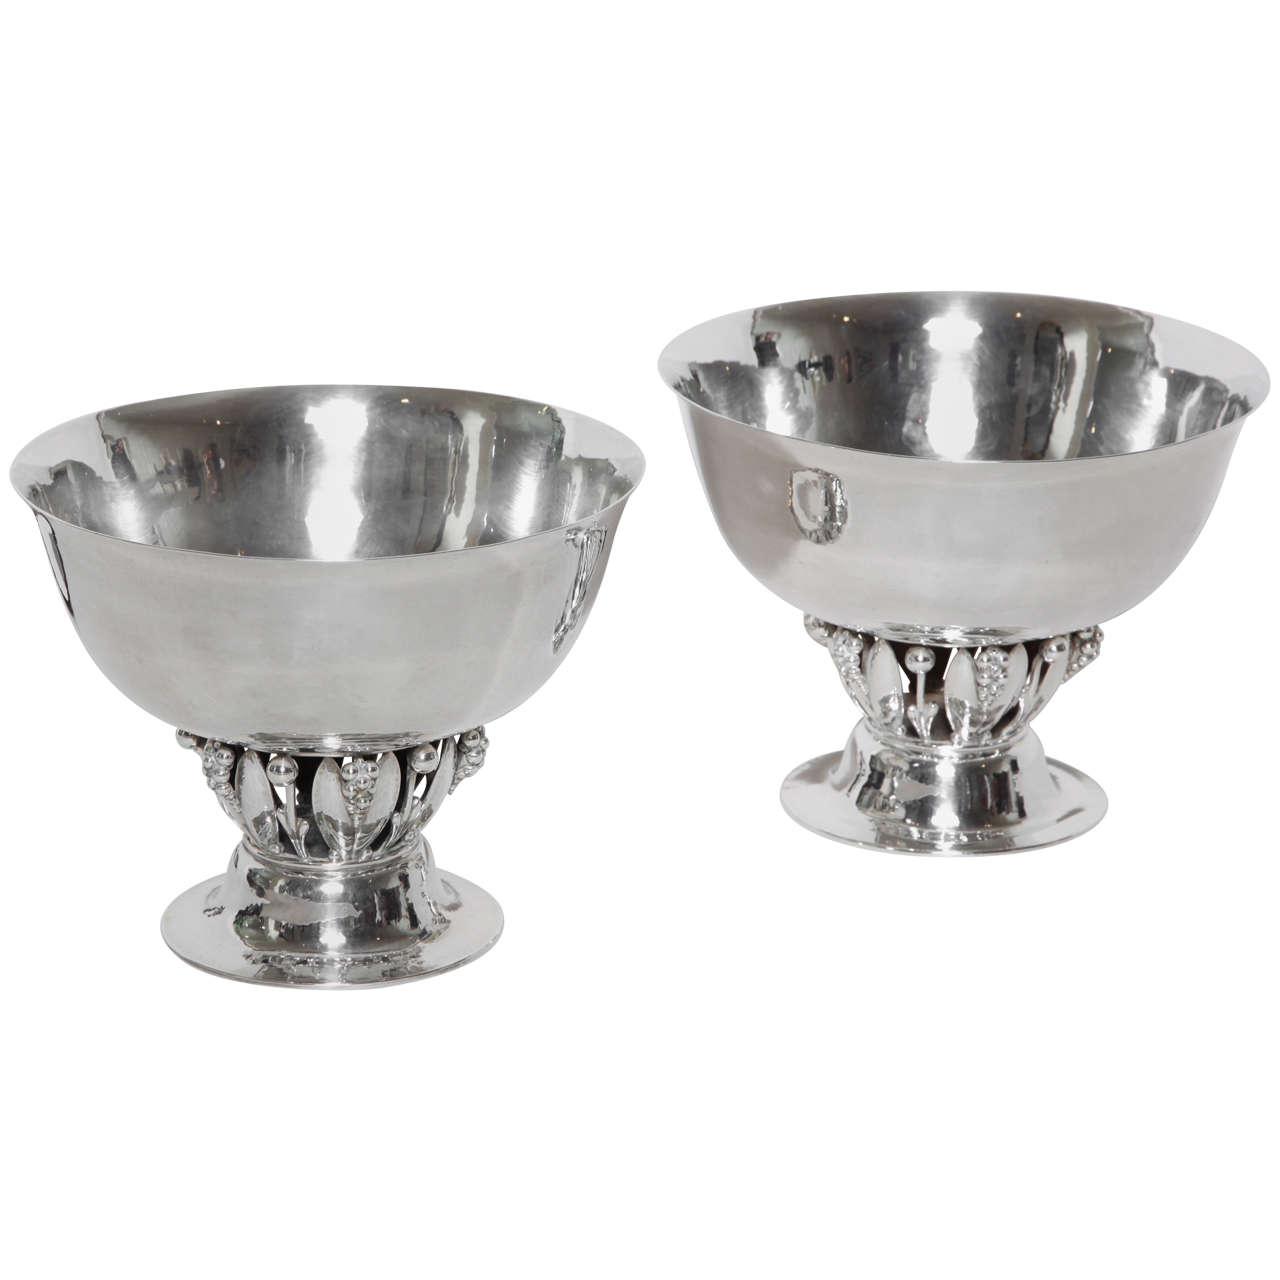 georg jensen danish pair of sterling silver compotes 197. Black Bedroom Furniture Sets. Home Design Ideas